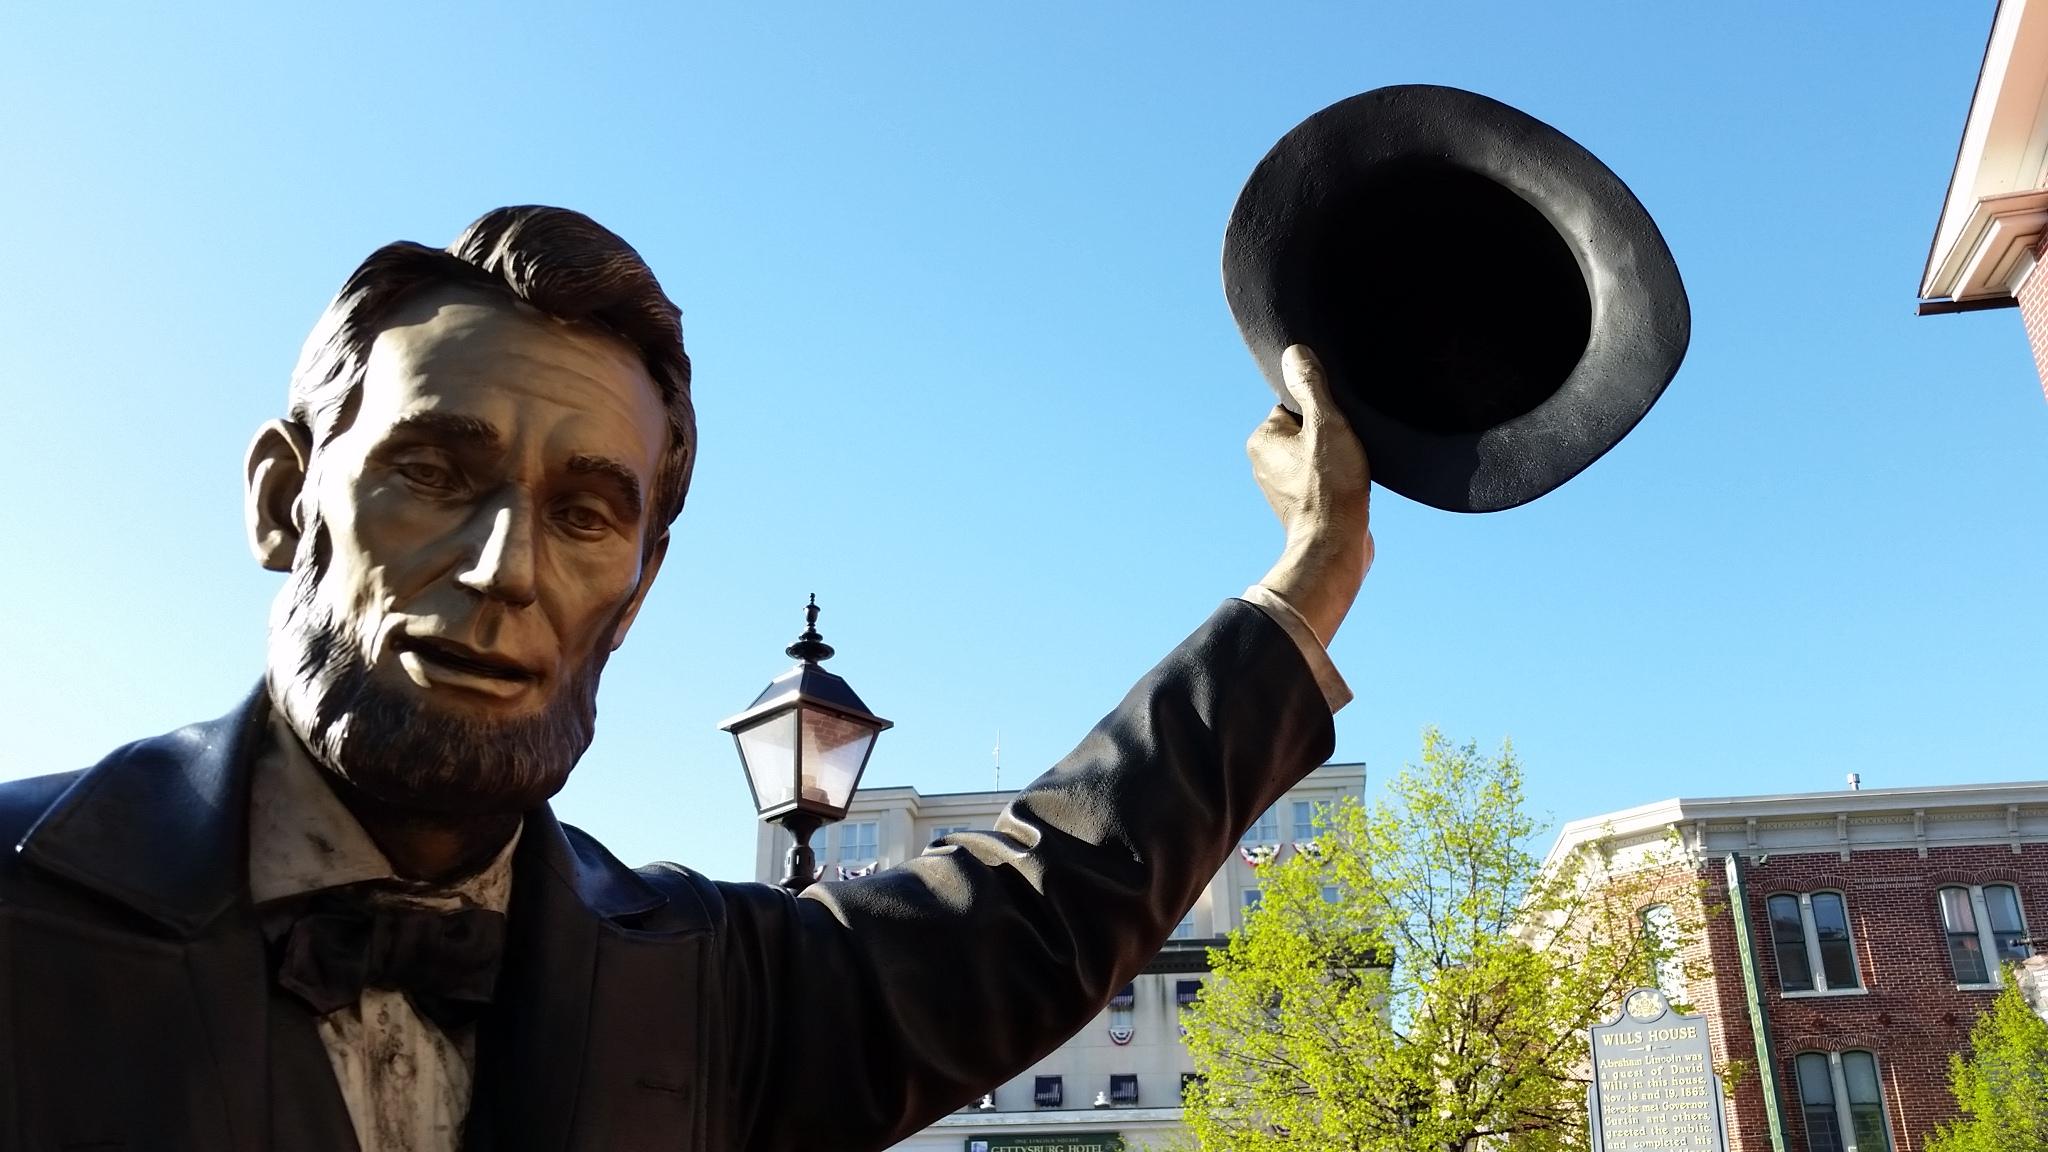 Statue of Abraham Lincoln at Lincoln Square in Gettysburg, Pennsylvania